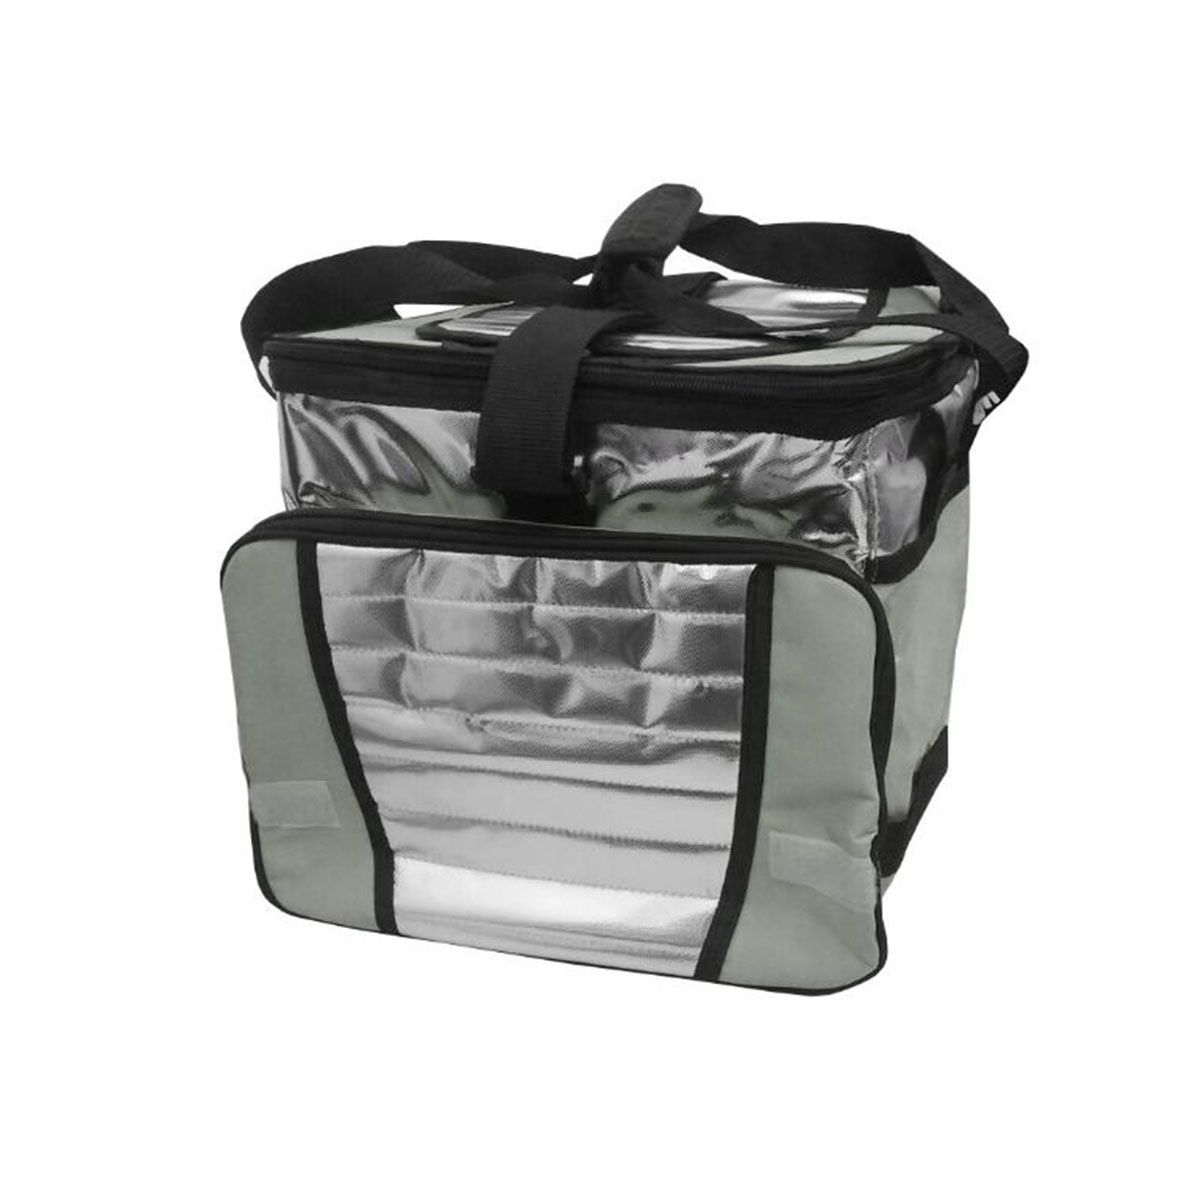 Bolsa Térmica Mor Ice Cooler 24 Litros Cinza - 1 Divisória